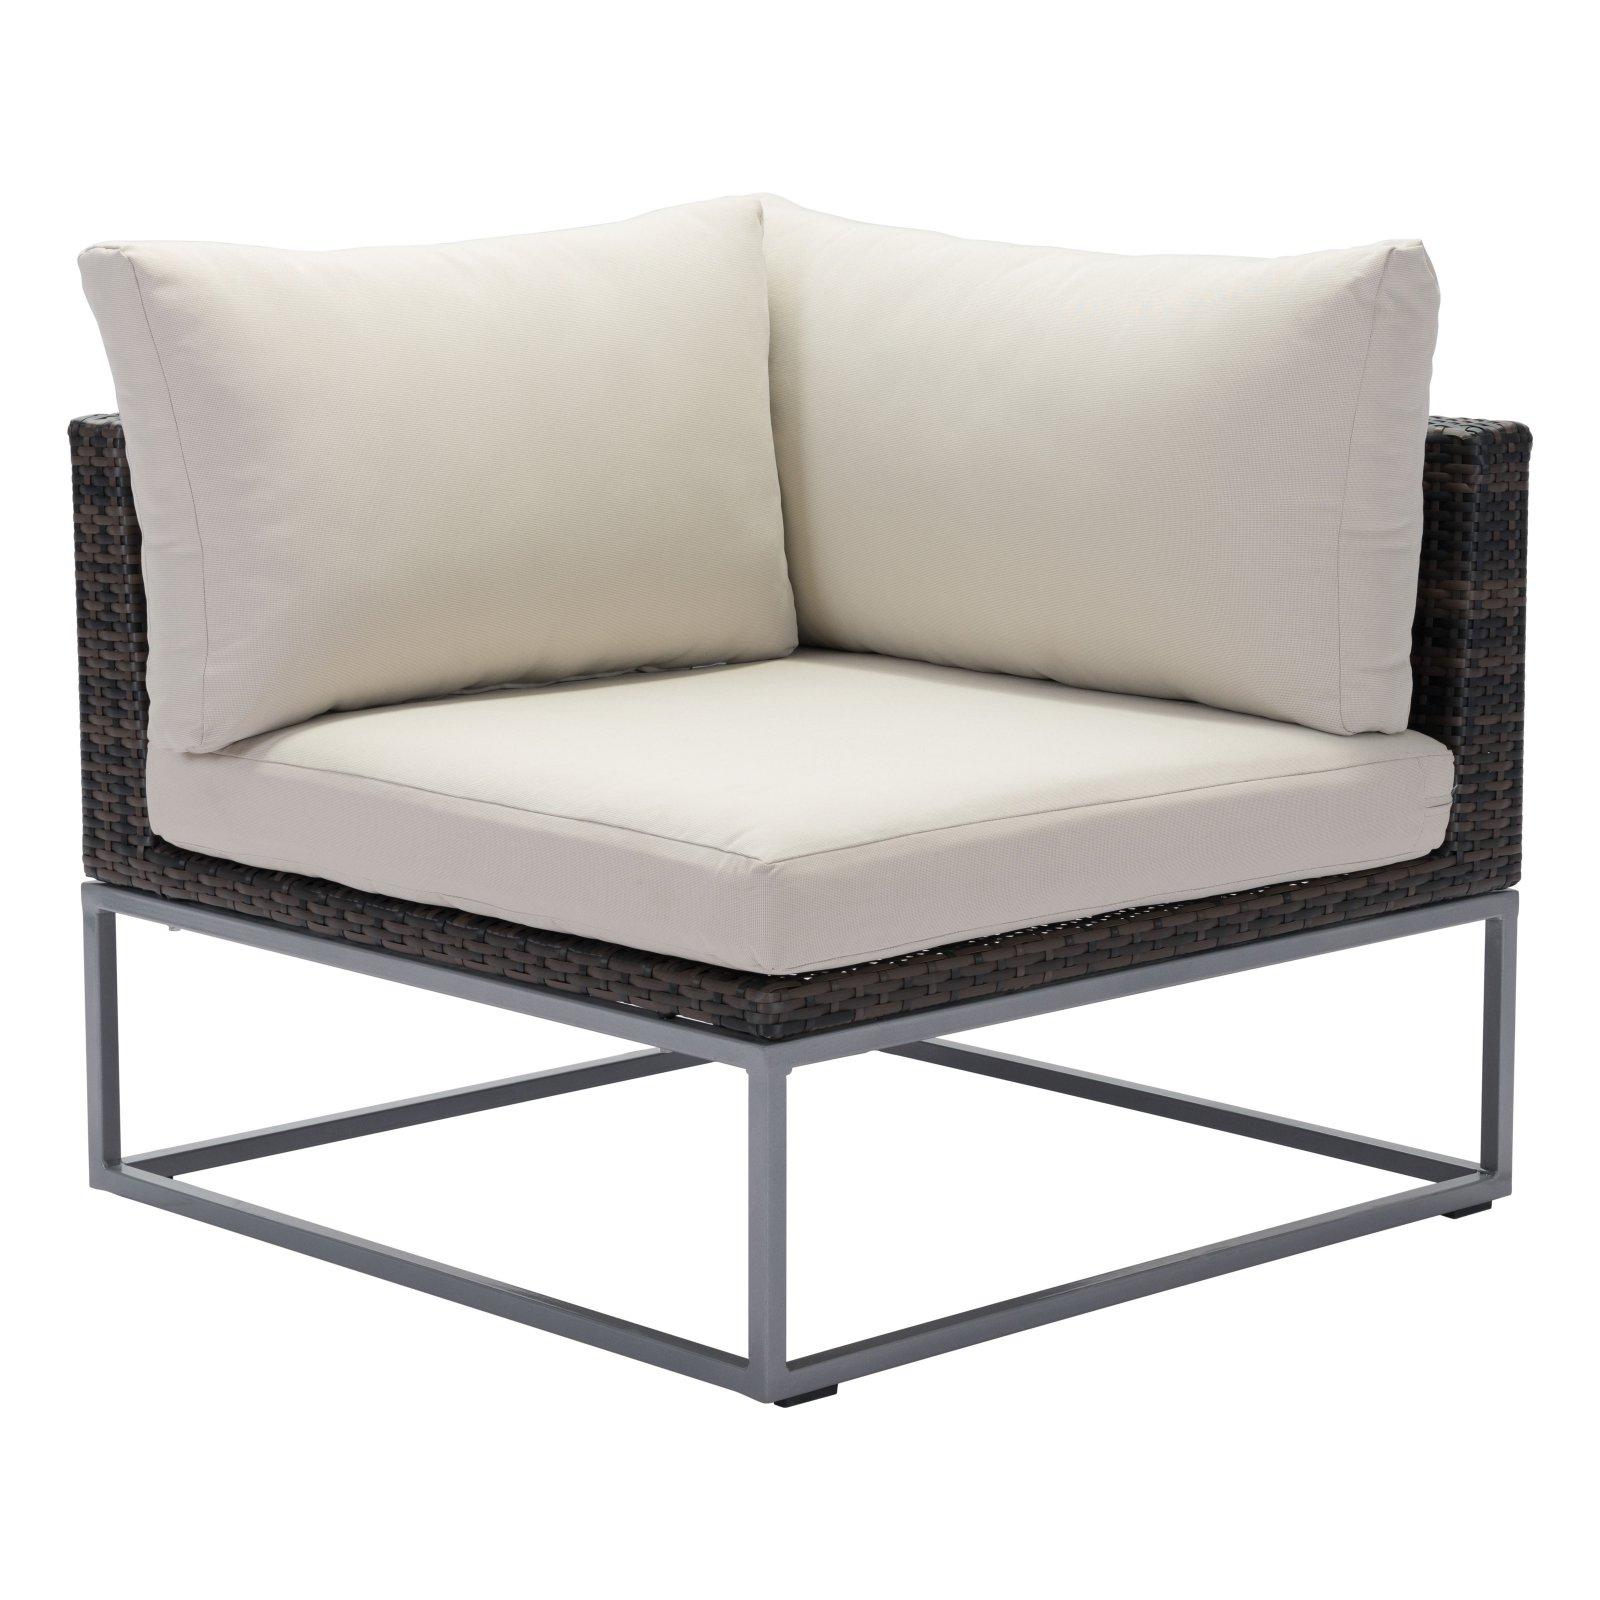 Zuo Modern Malibu Aluminum Patio Corner Chair - $7.00 (Orig $699) - Walmart B&M EXTREME YMMV